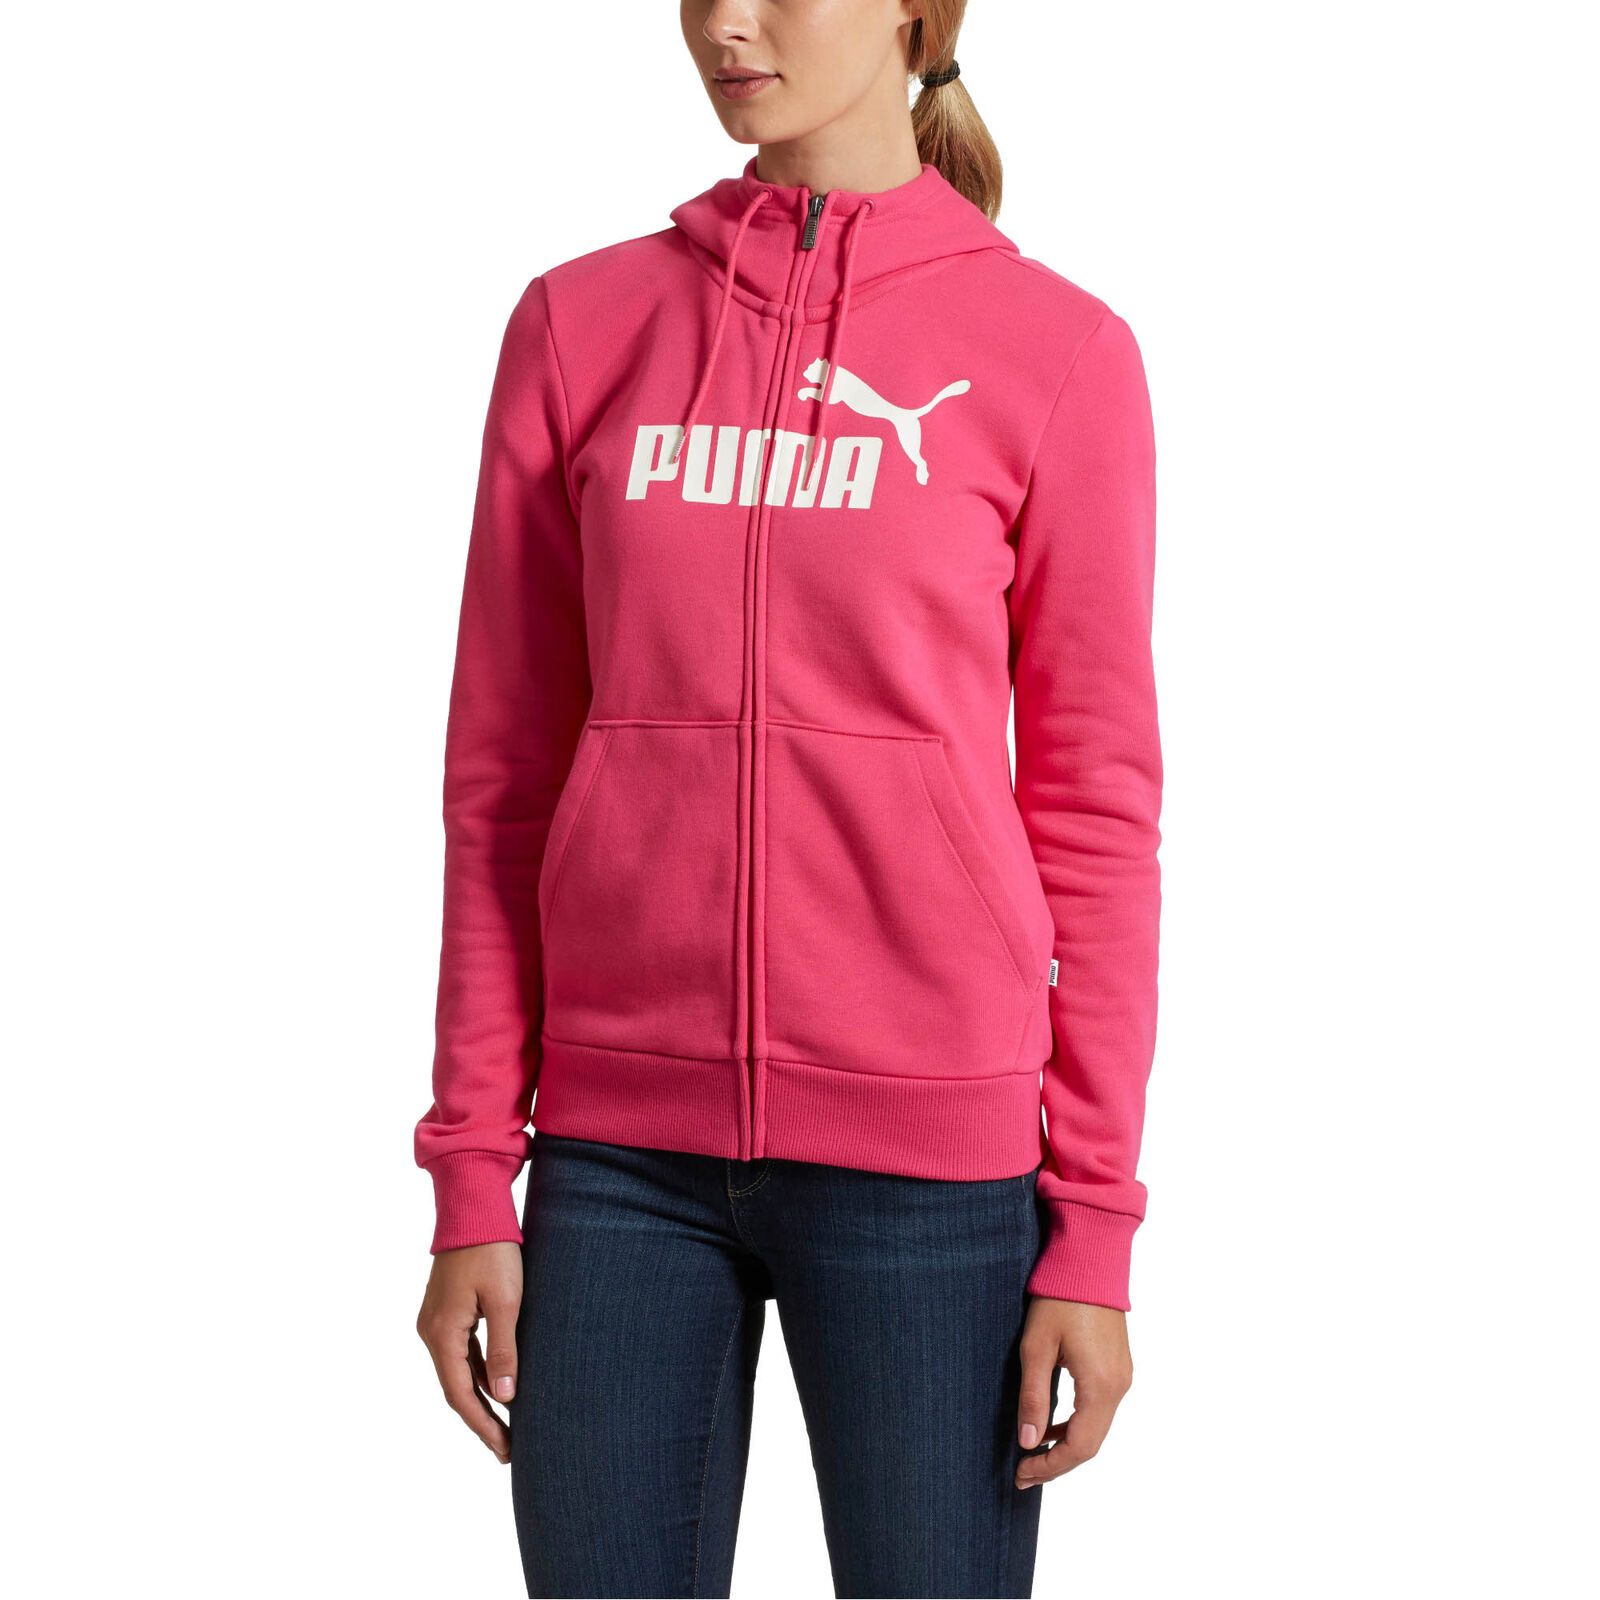 Puma Womens Essential Logo Cotton Full-Zip Training Hoodie Casual Fleece Warm